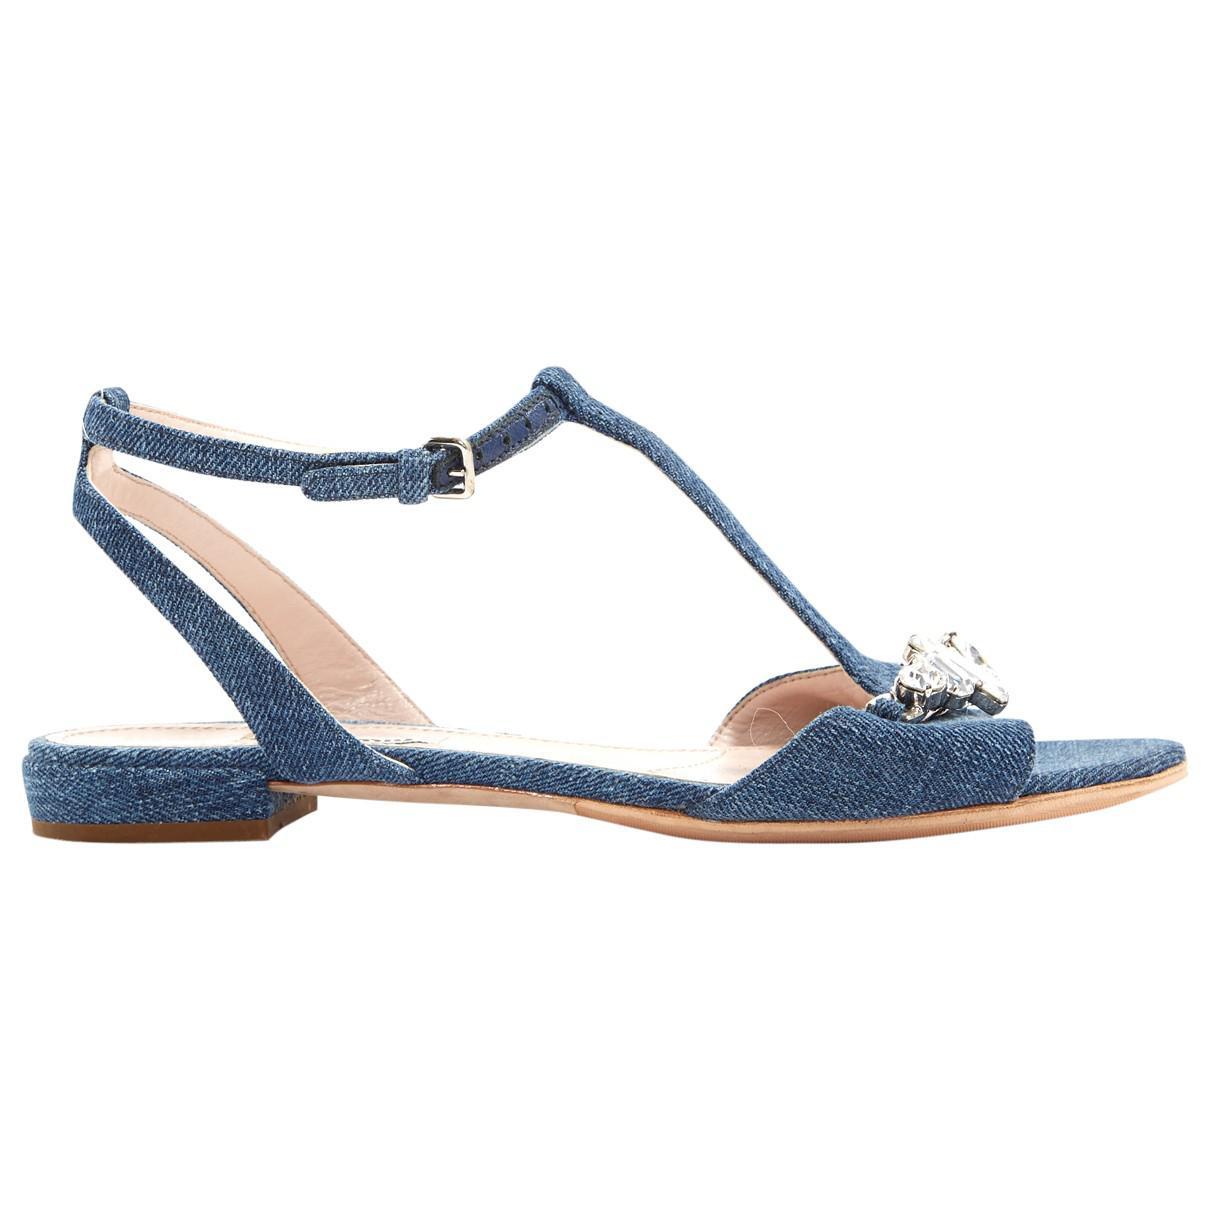 Pre-owned - Cloth sandal Miu Miu moS4M